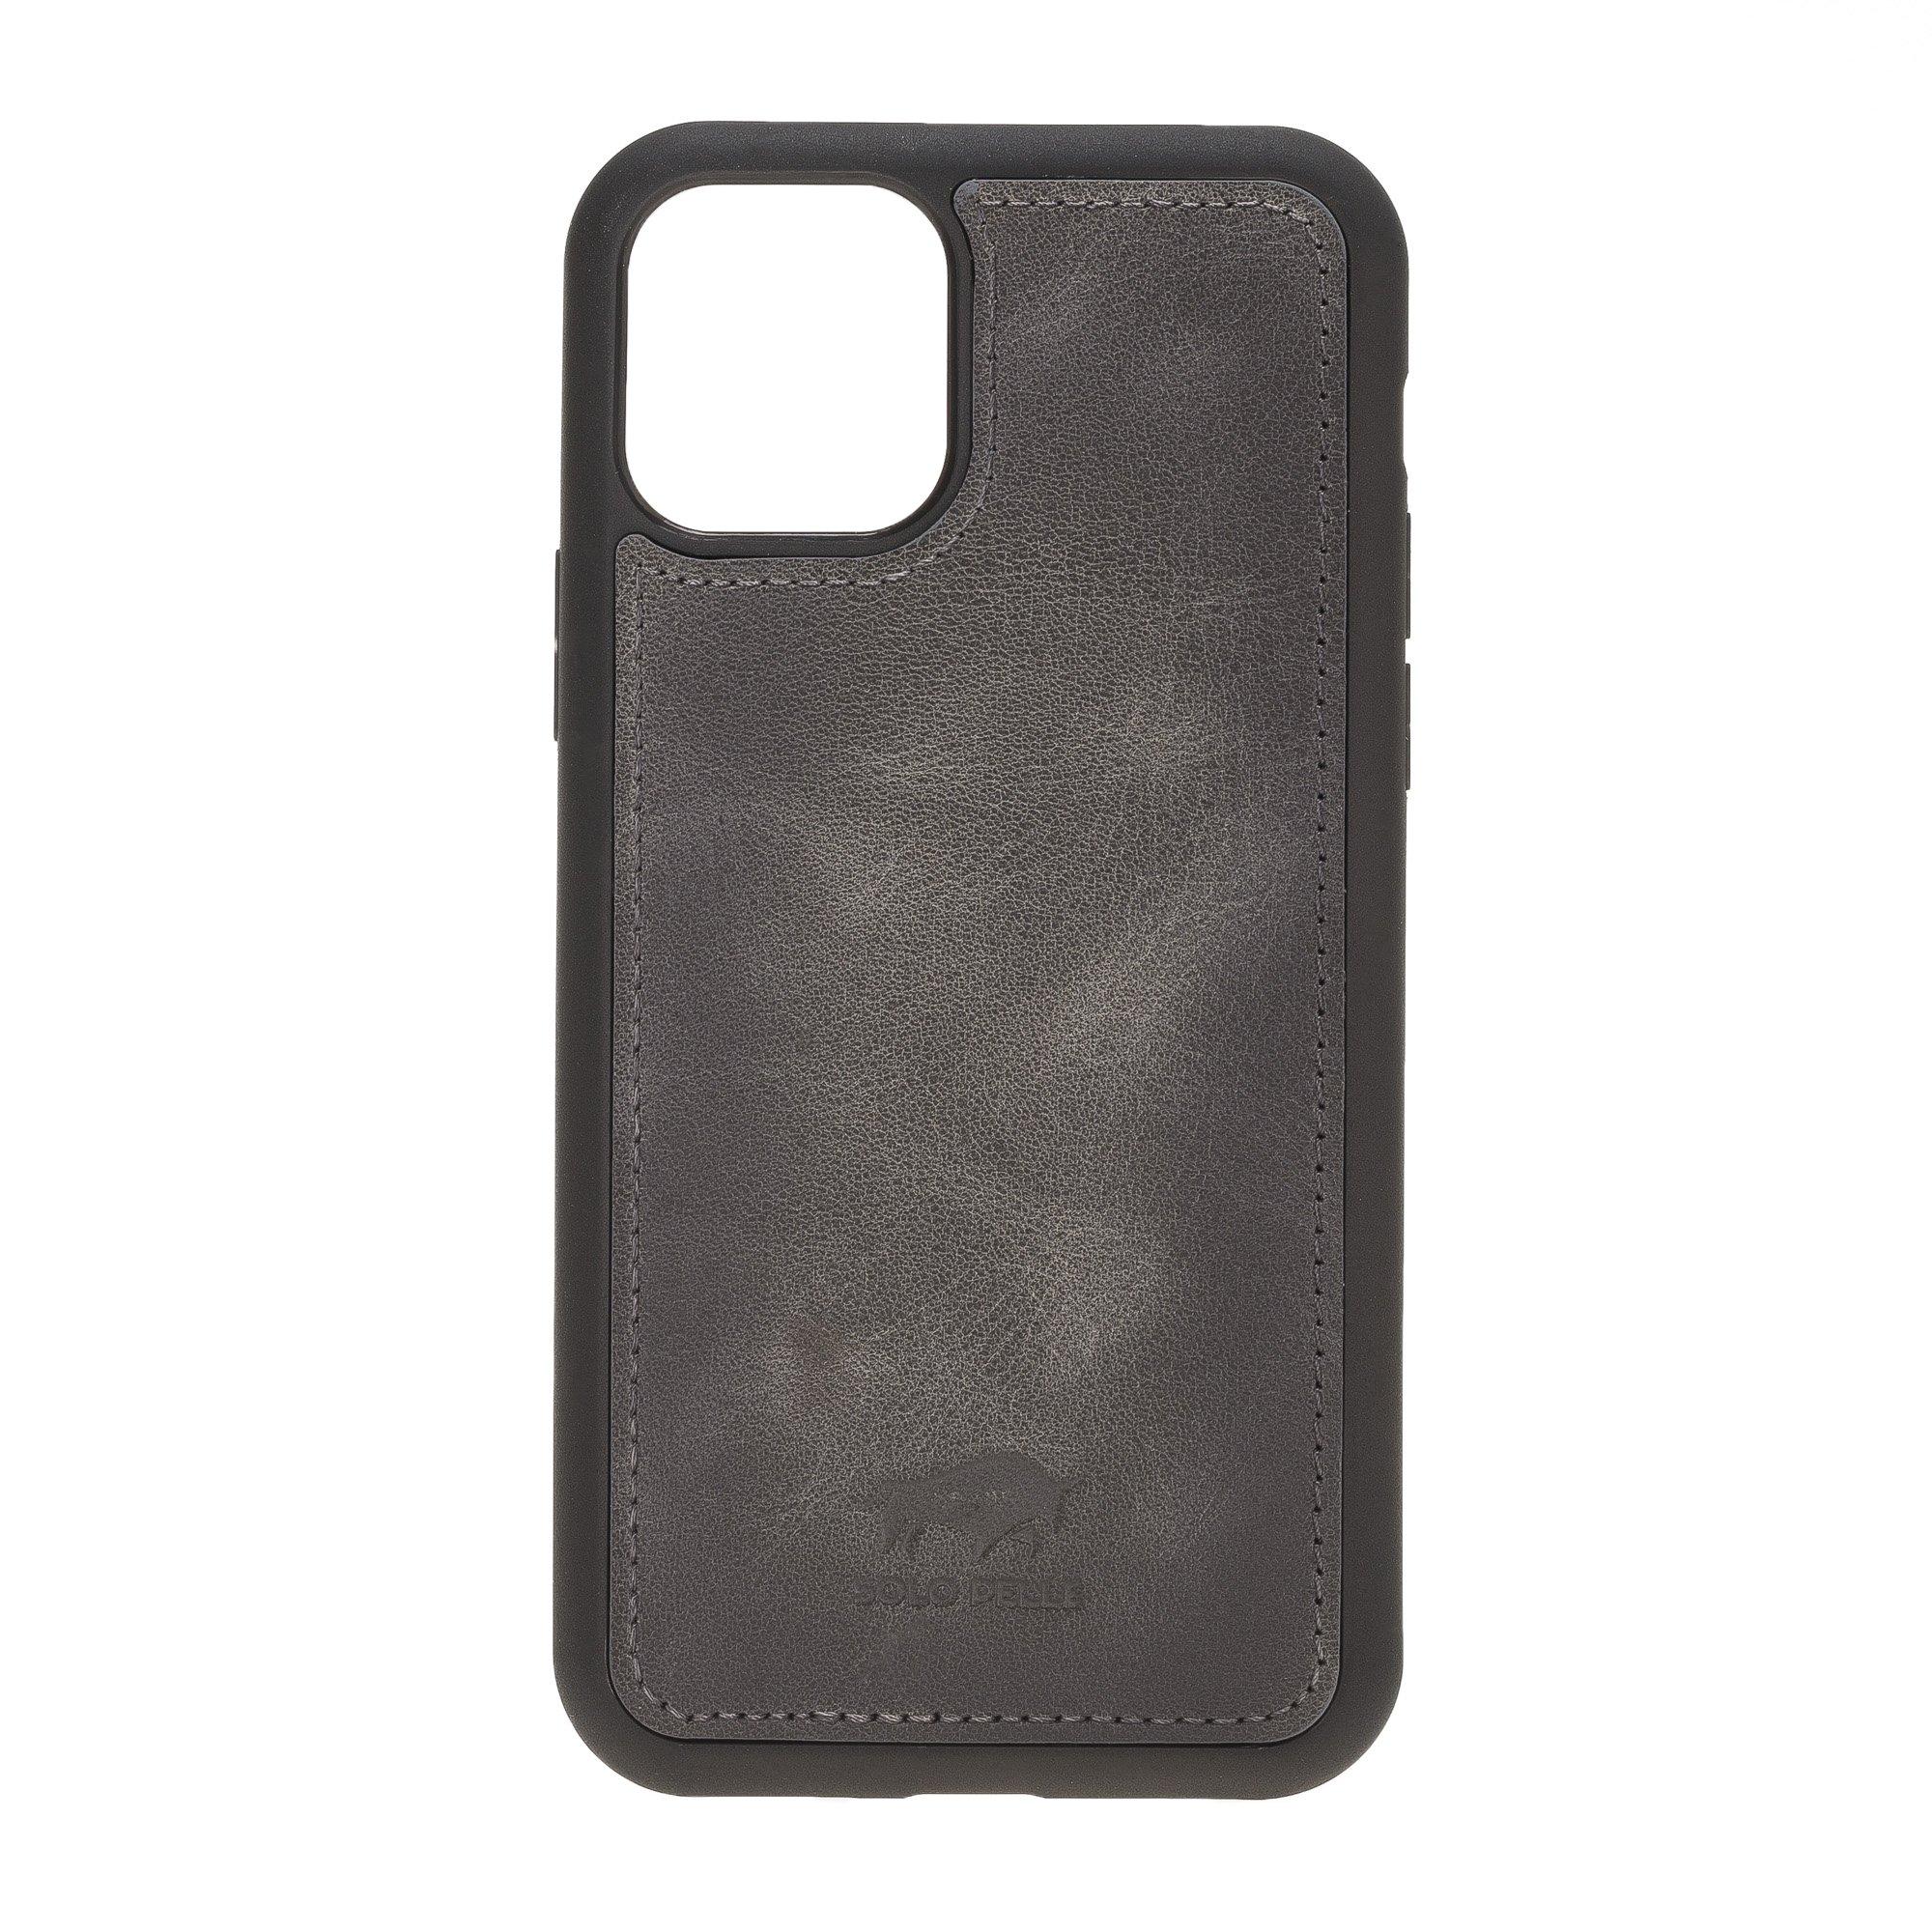 Solo Pelle Lederhülle kompatibel für iPhone 11 in 6.1 Zoll abnehmbare Hülle (2in1) inkl. Kartenfächer für das original Apple iPhone 11 (Steingrau Burned)